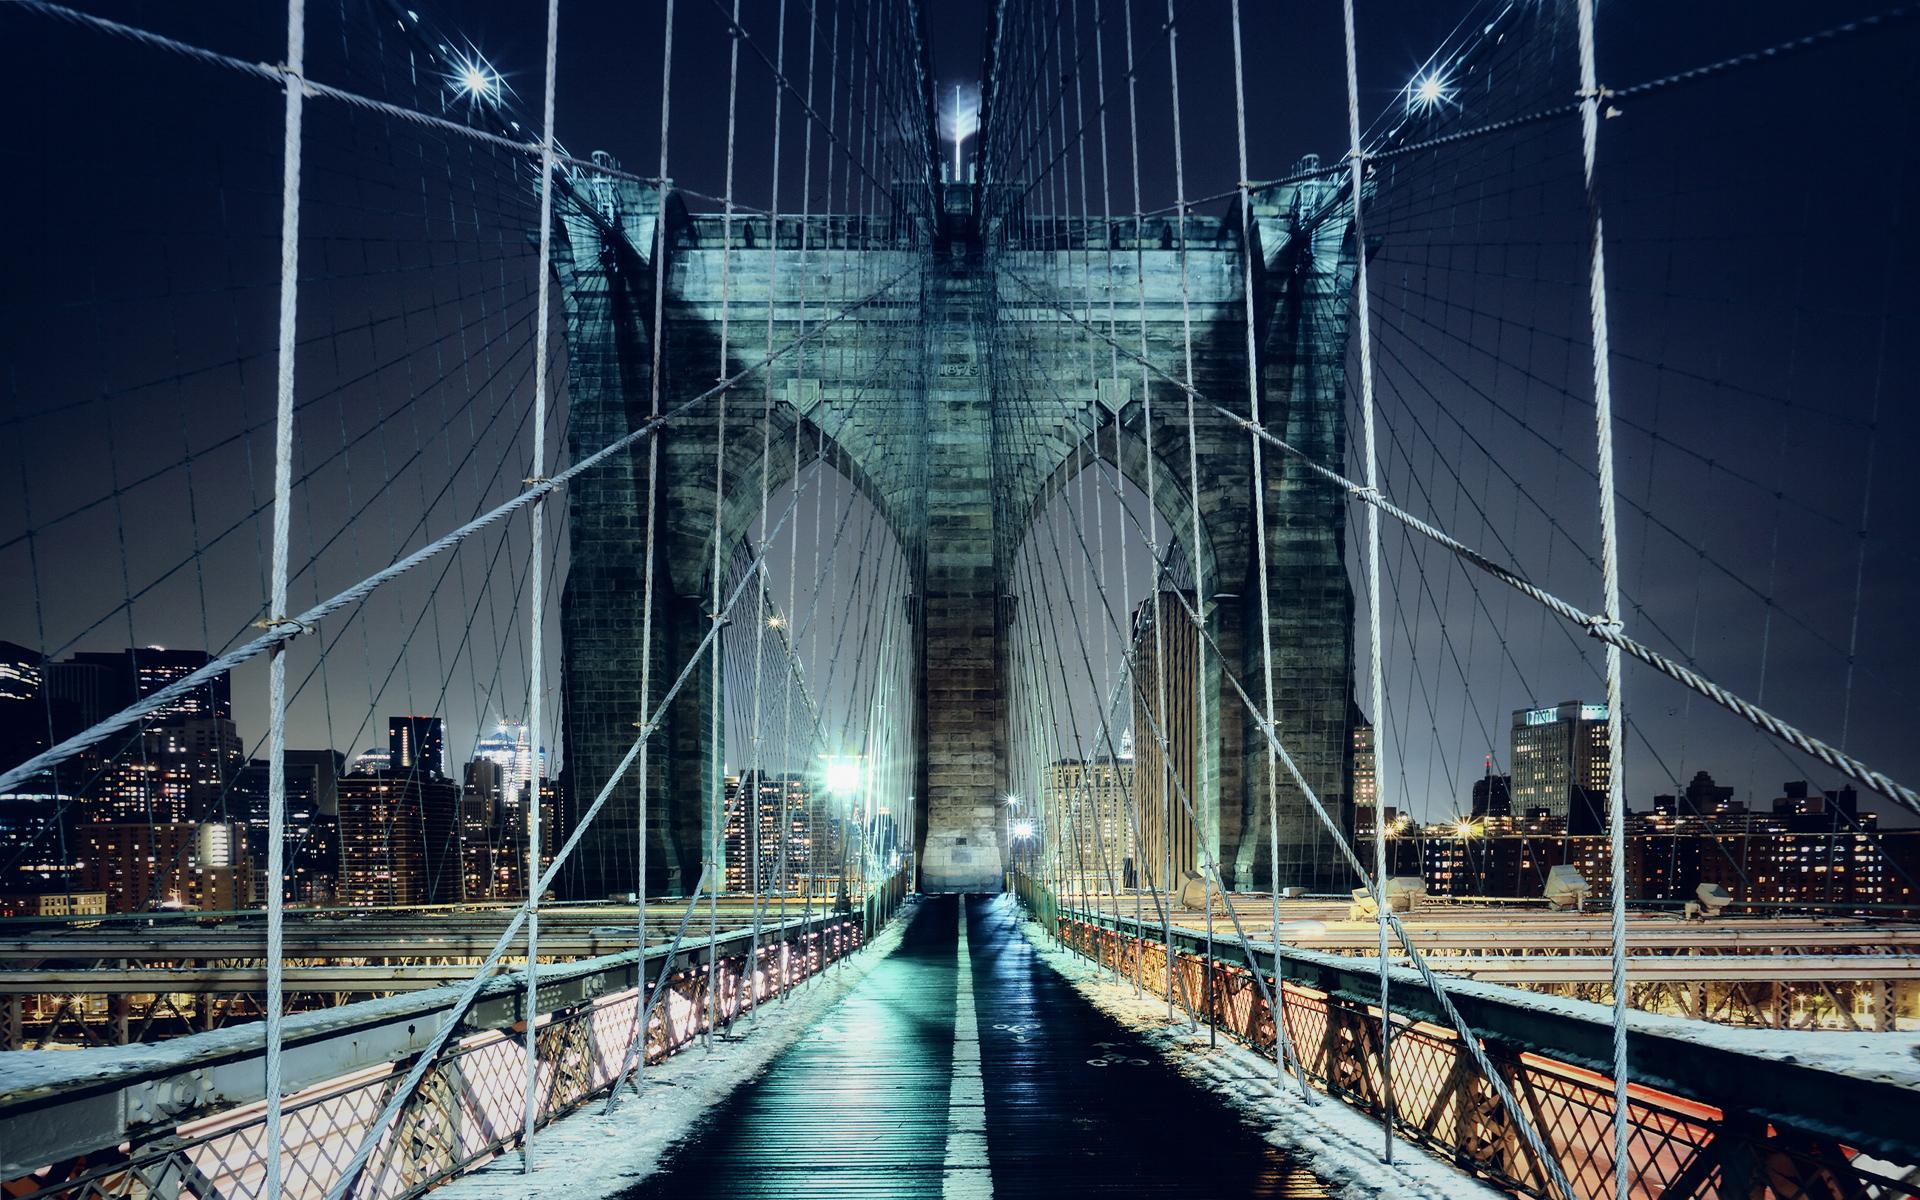 Brooklyn Bridge, Brooklyn Bridge Park and Jane's Carousel